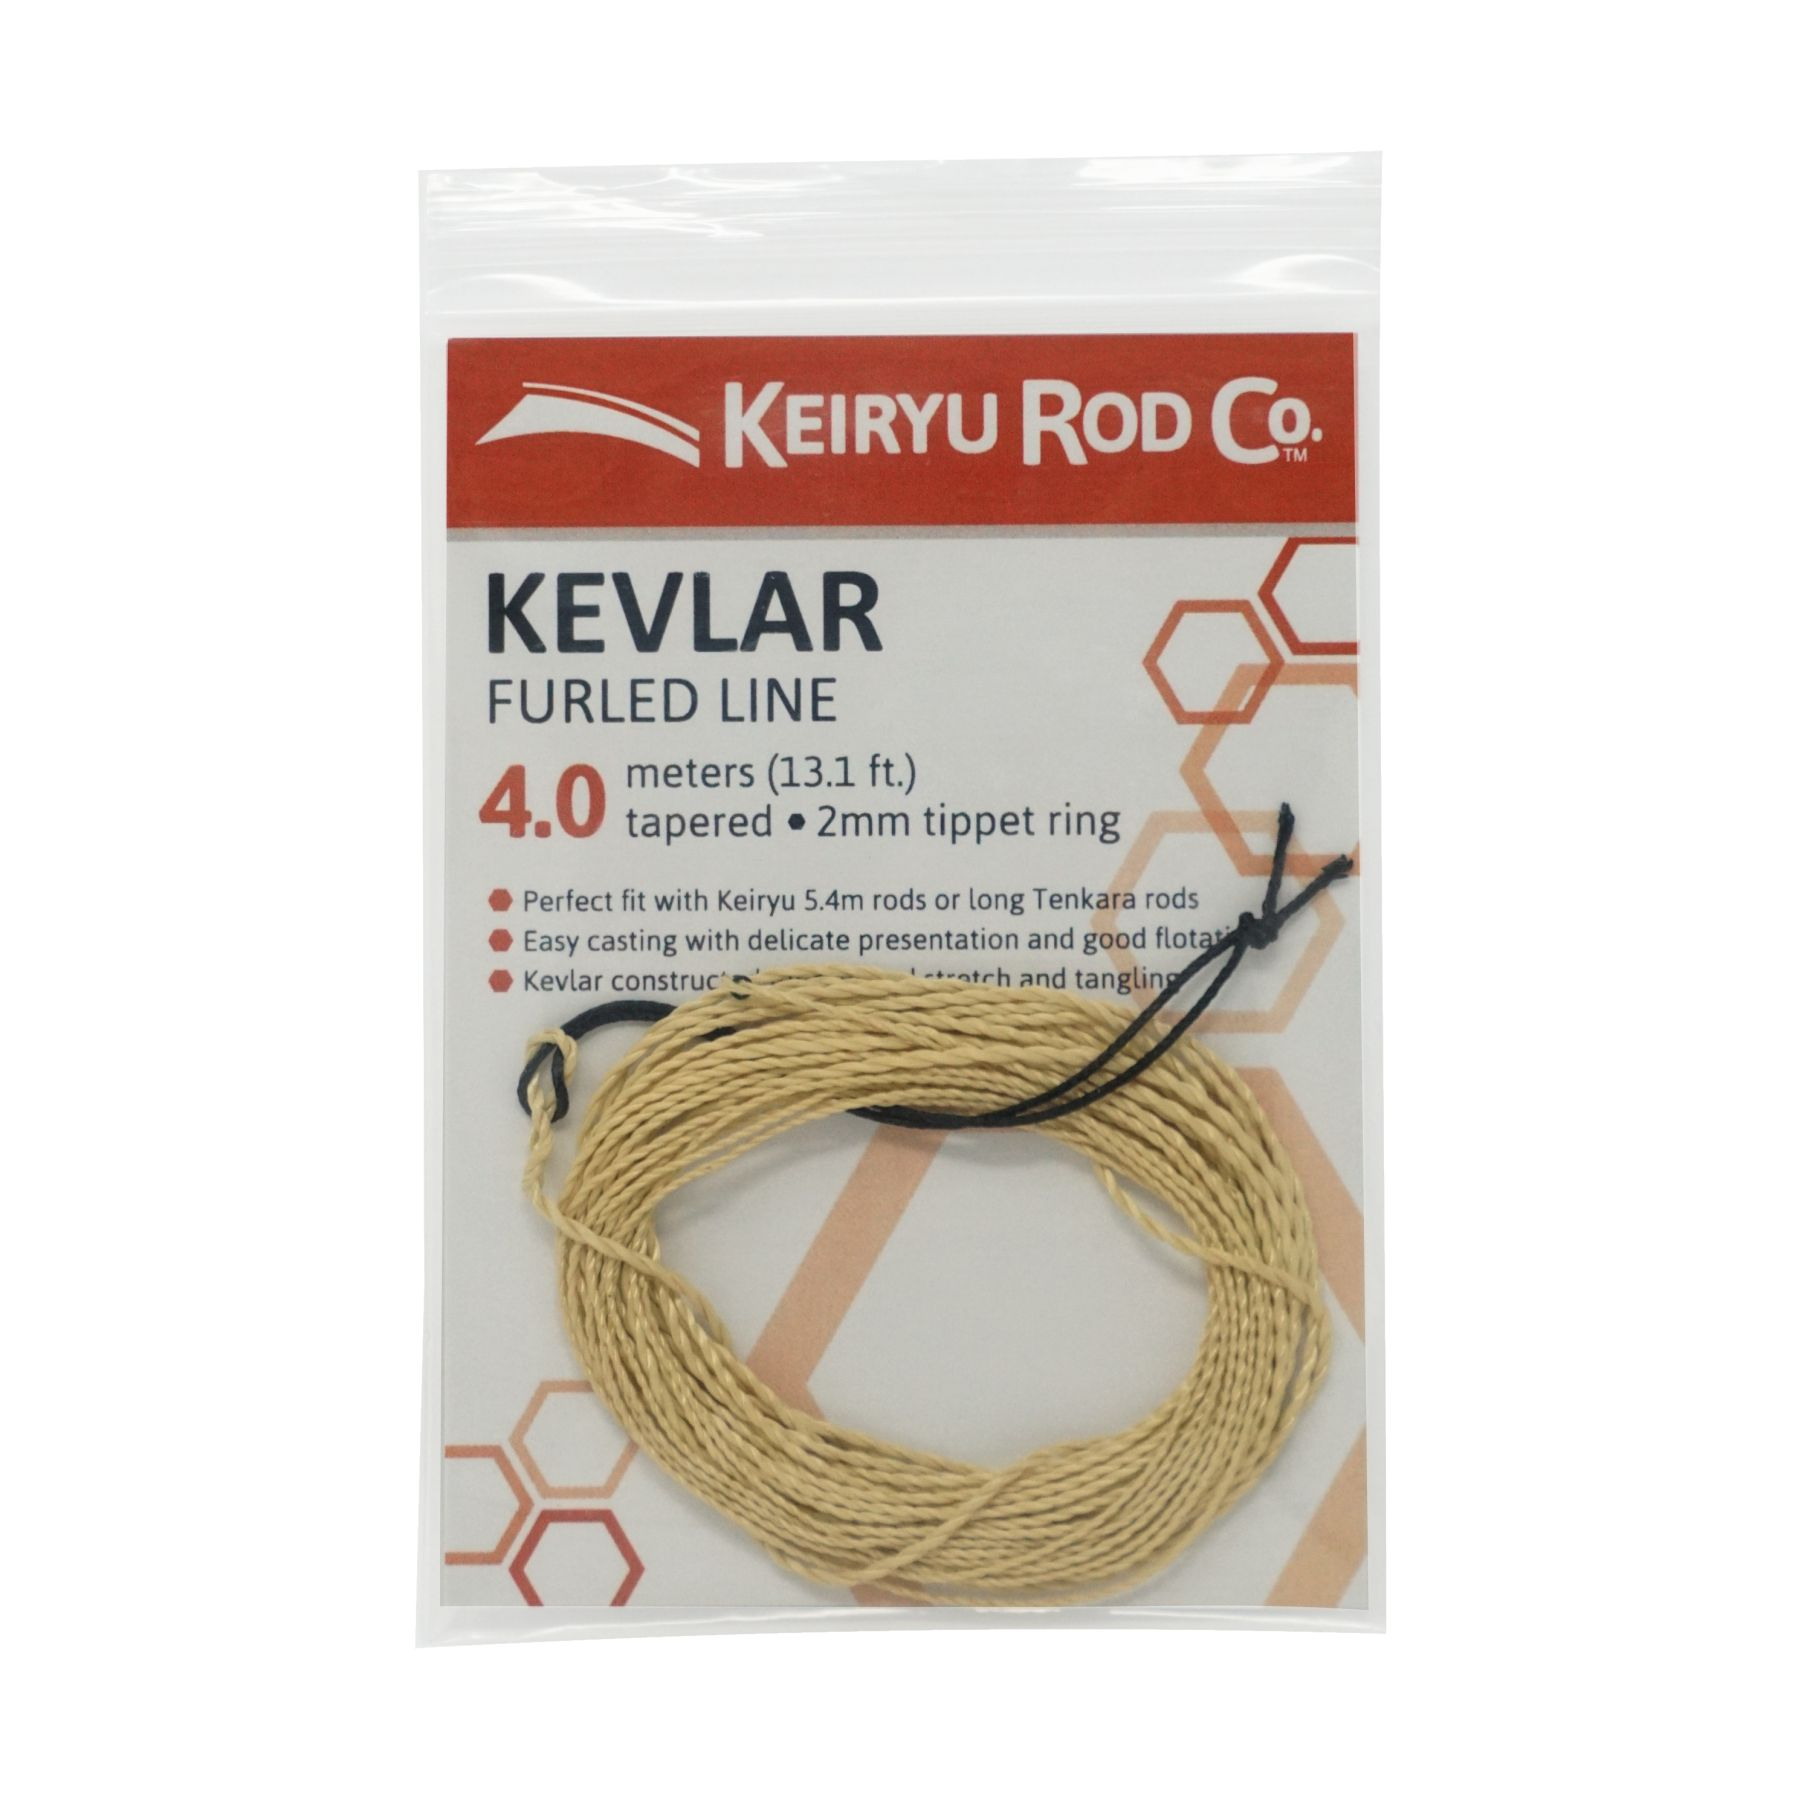 Keiryu Rod Co. Kevlar Line